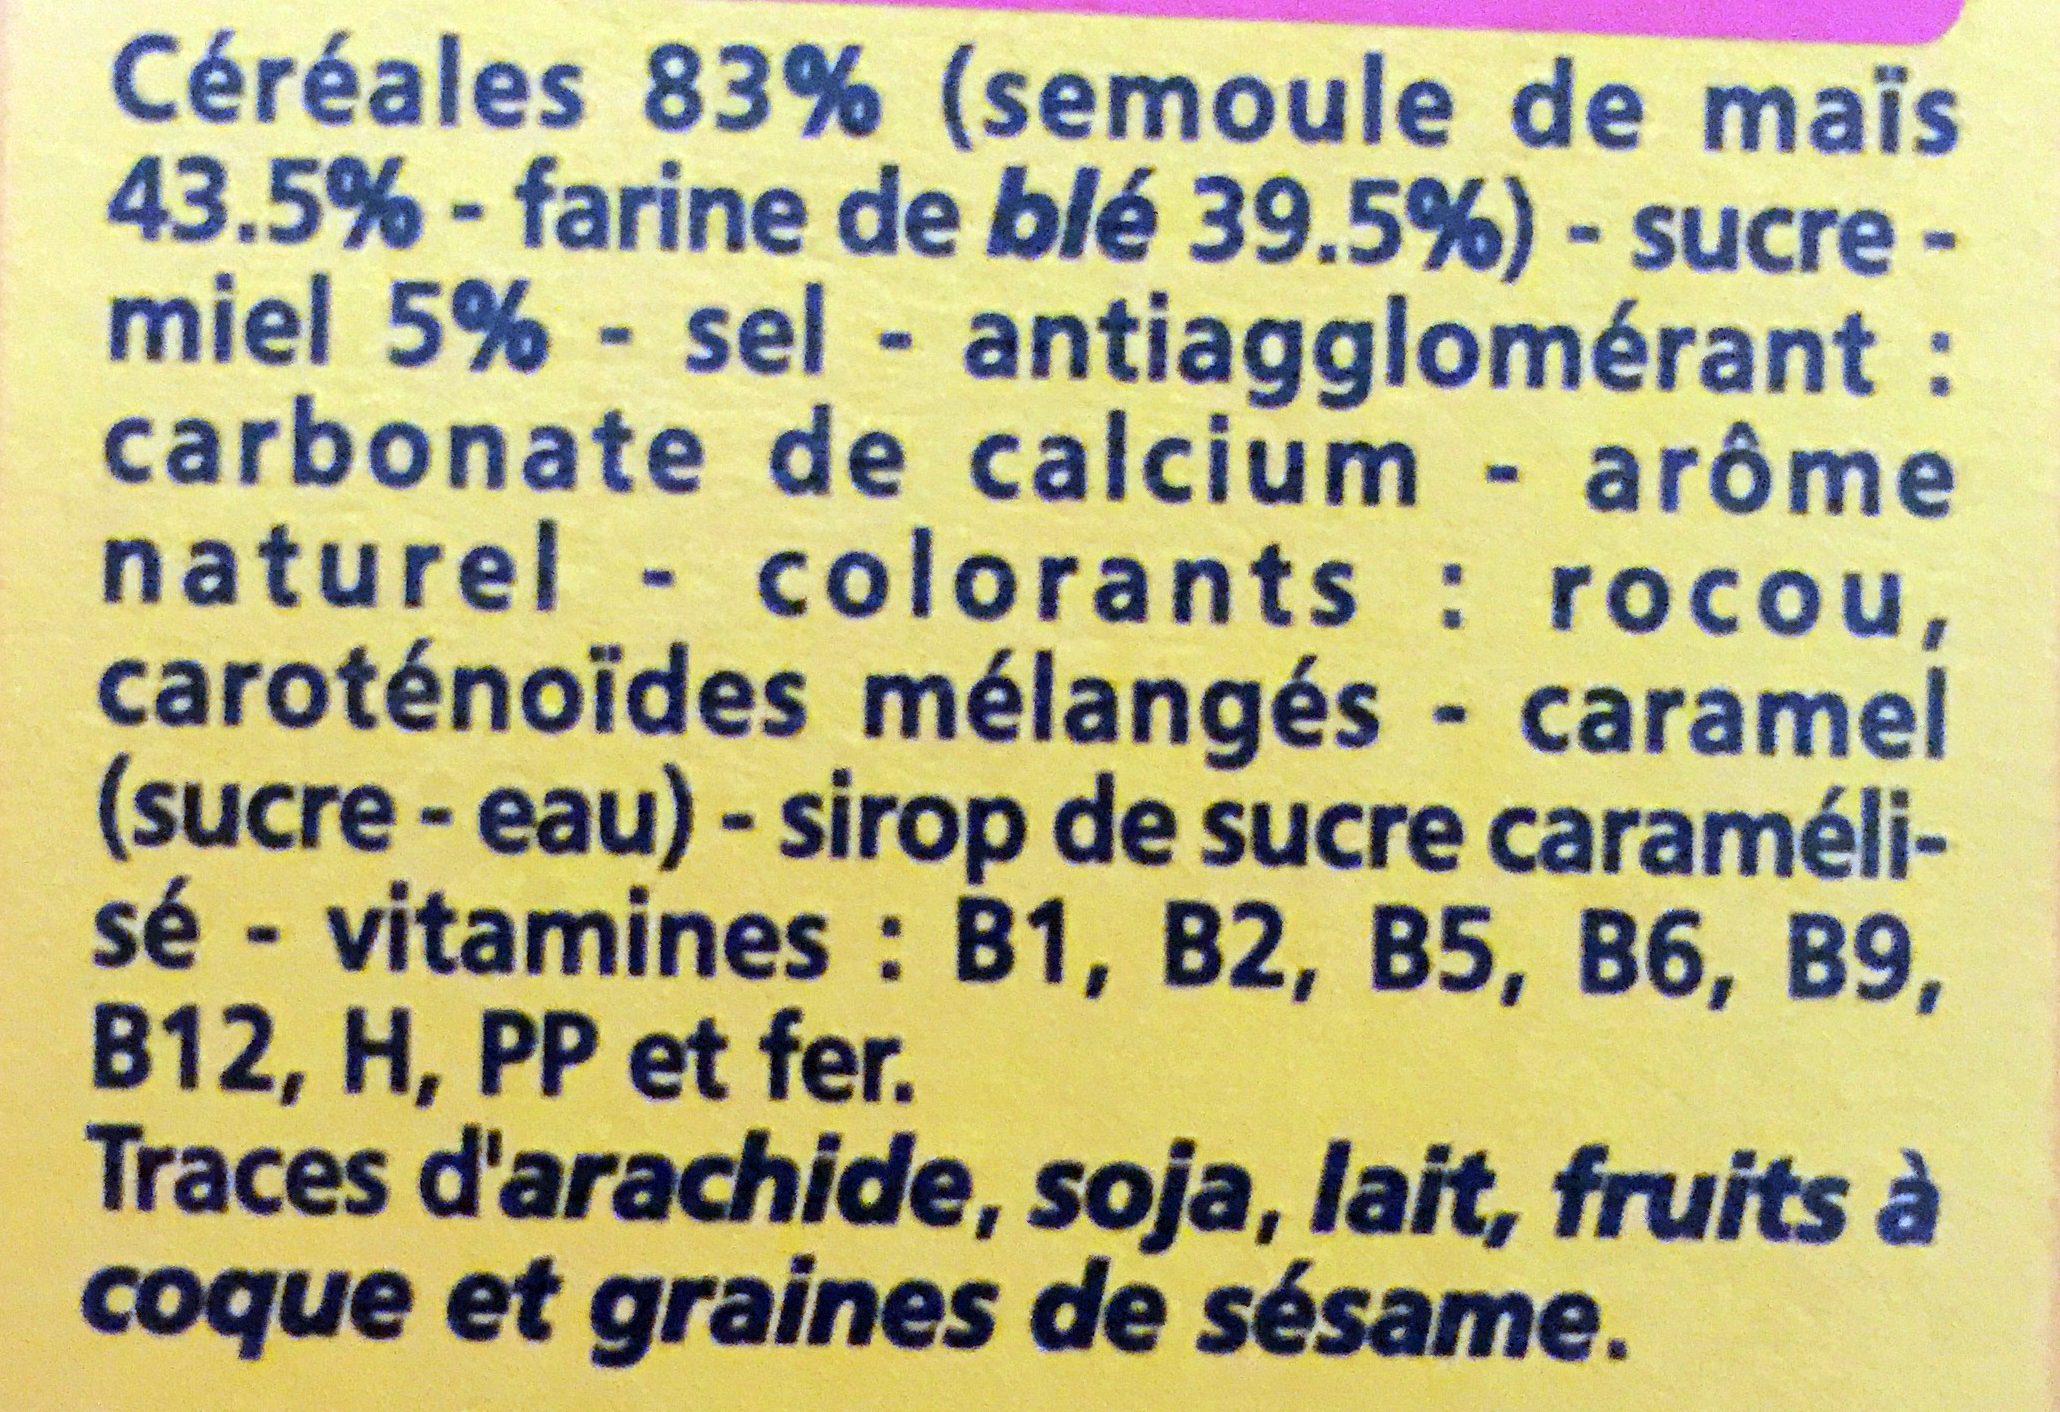 P'tites Billes Miel - Ingrediënten - fr